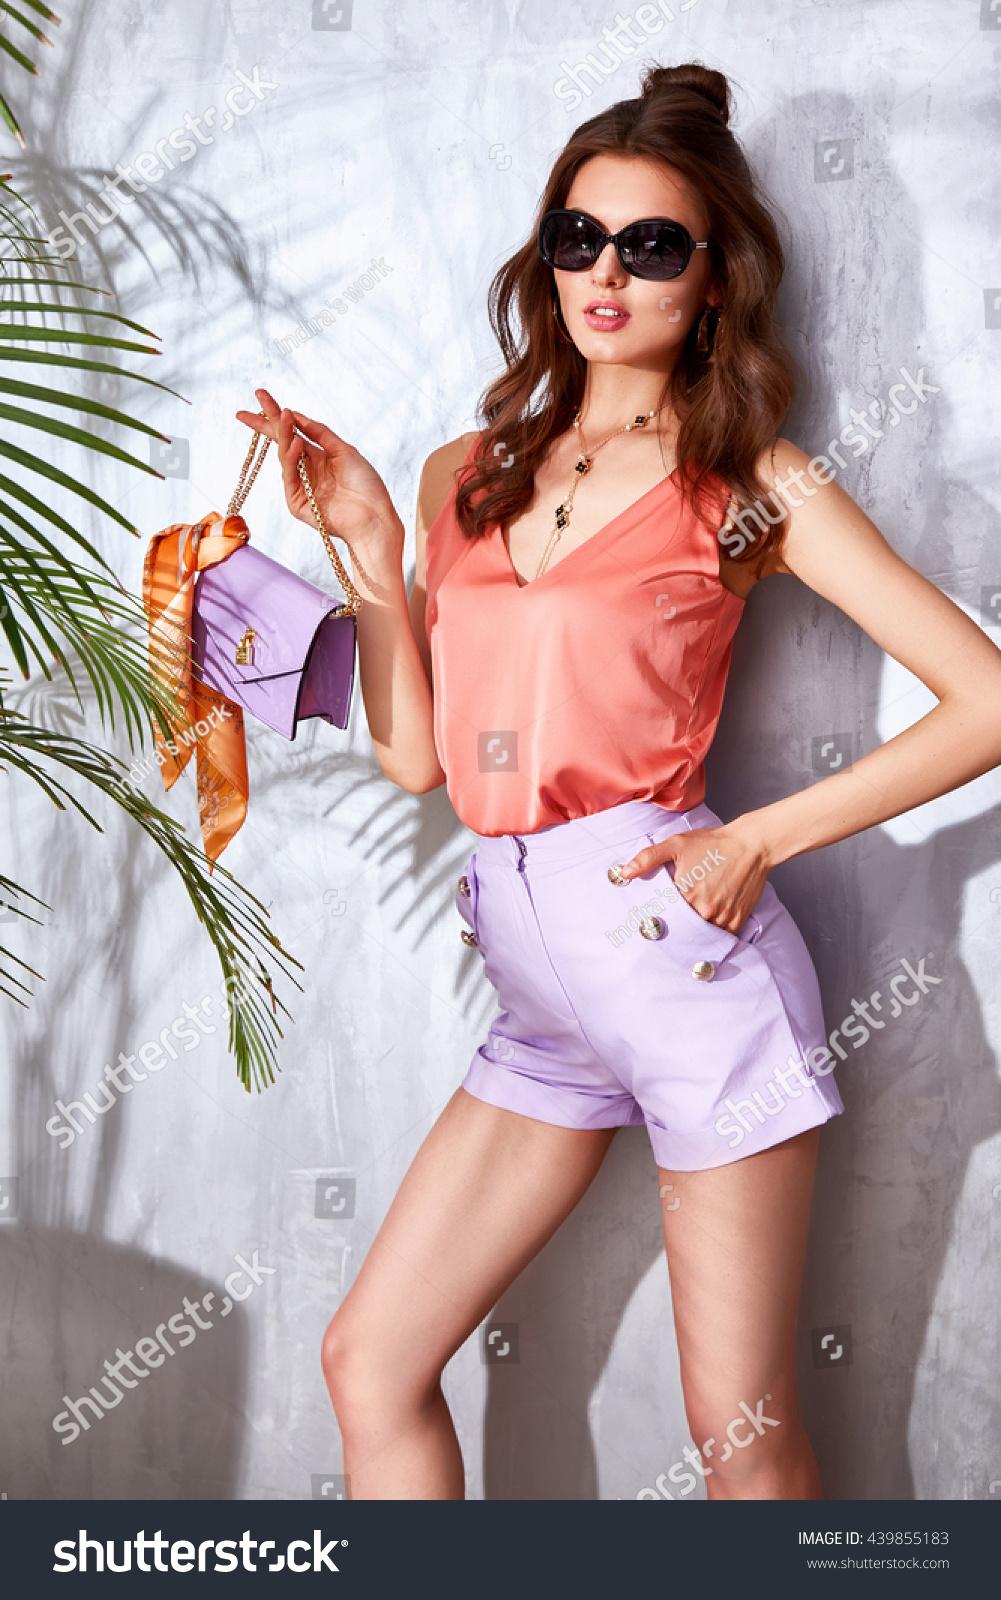 Fashion style Lady stylish photo for woman